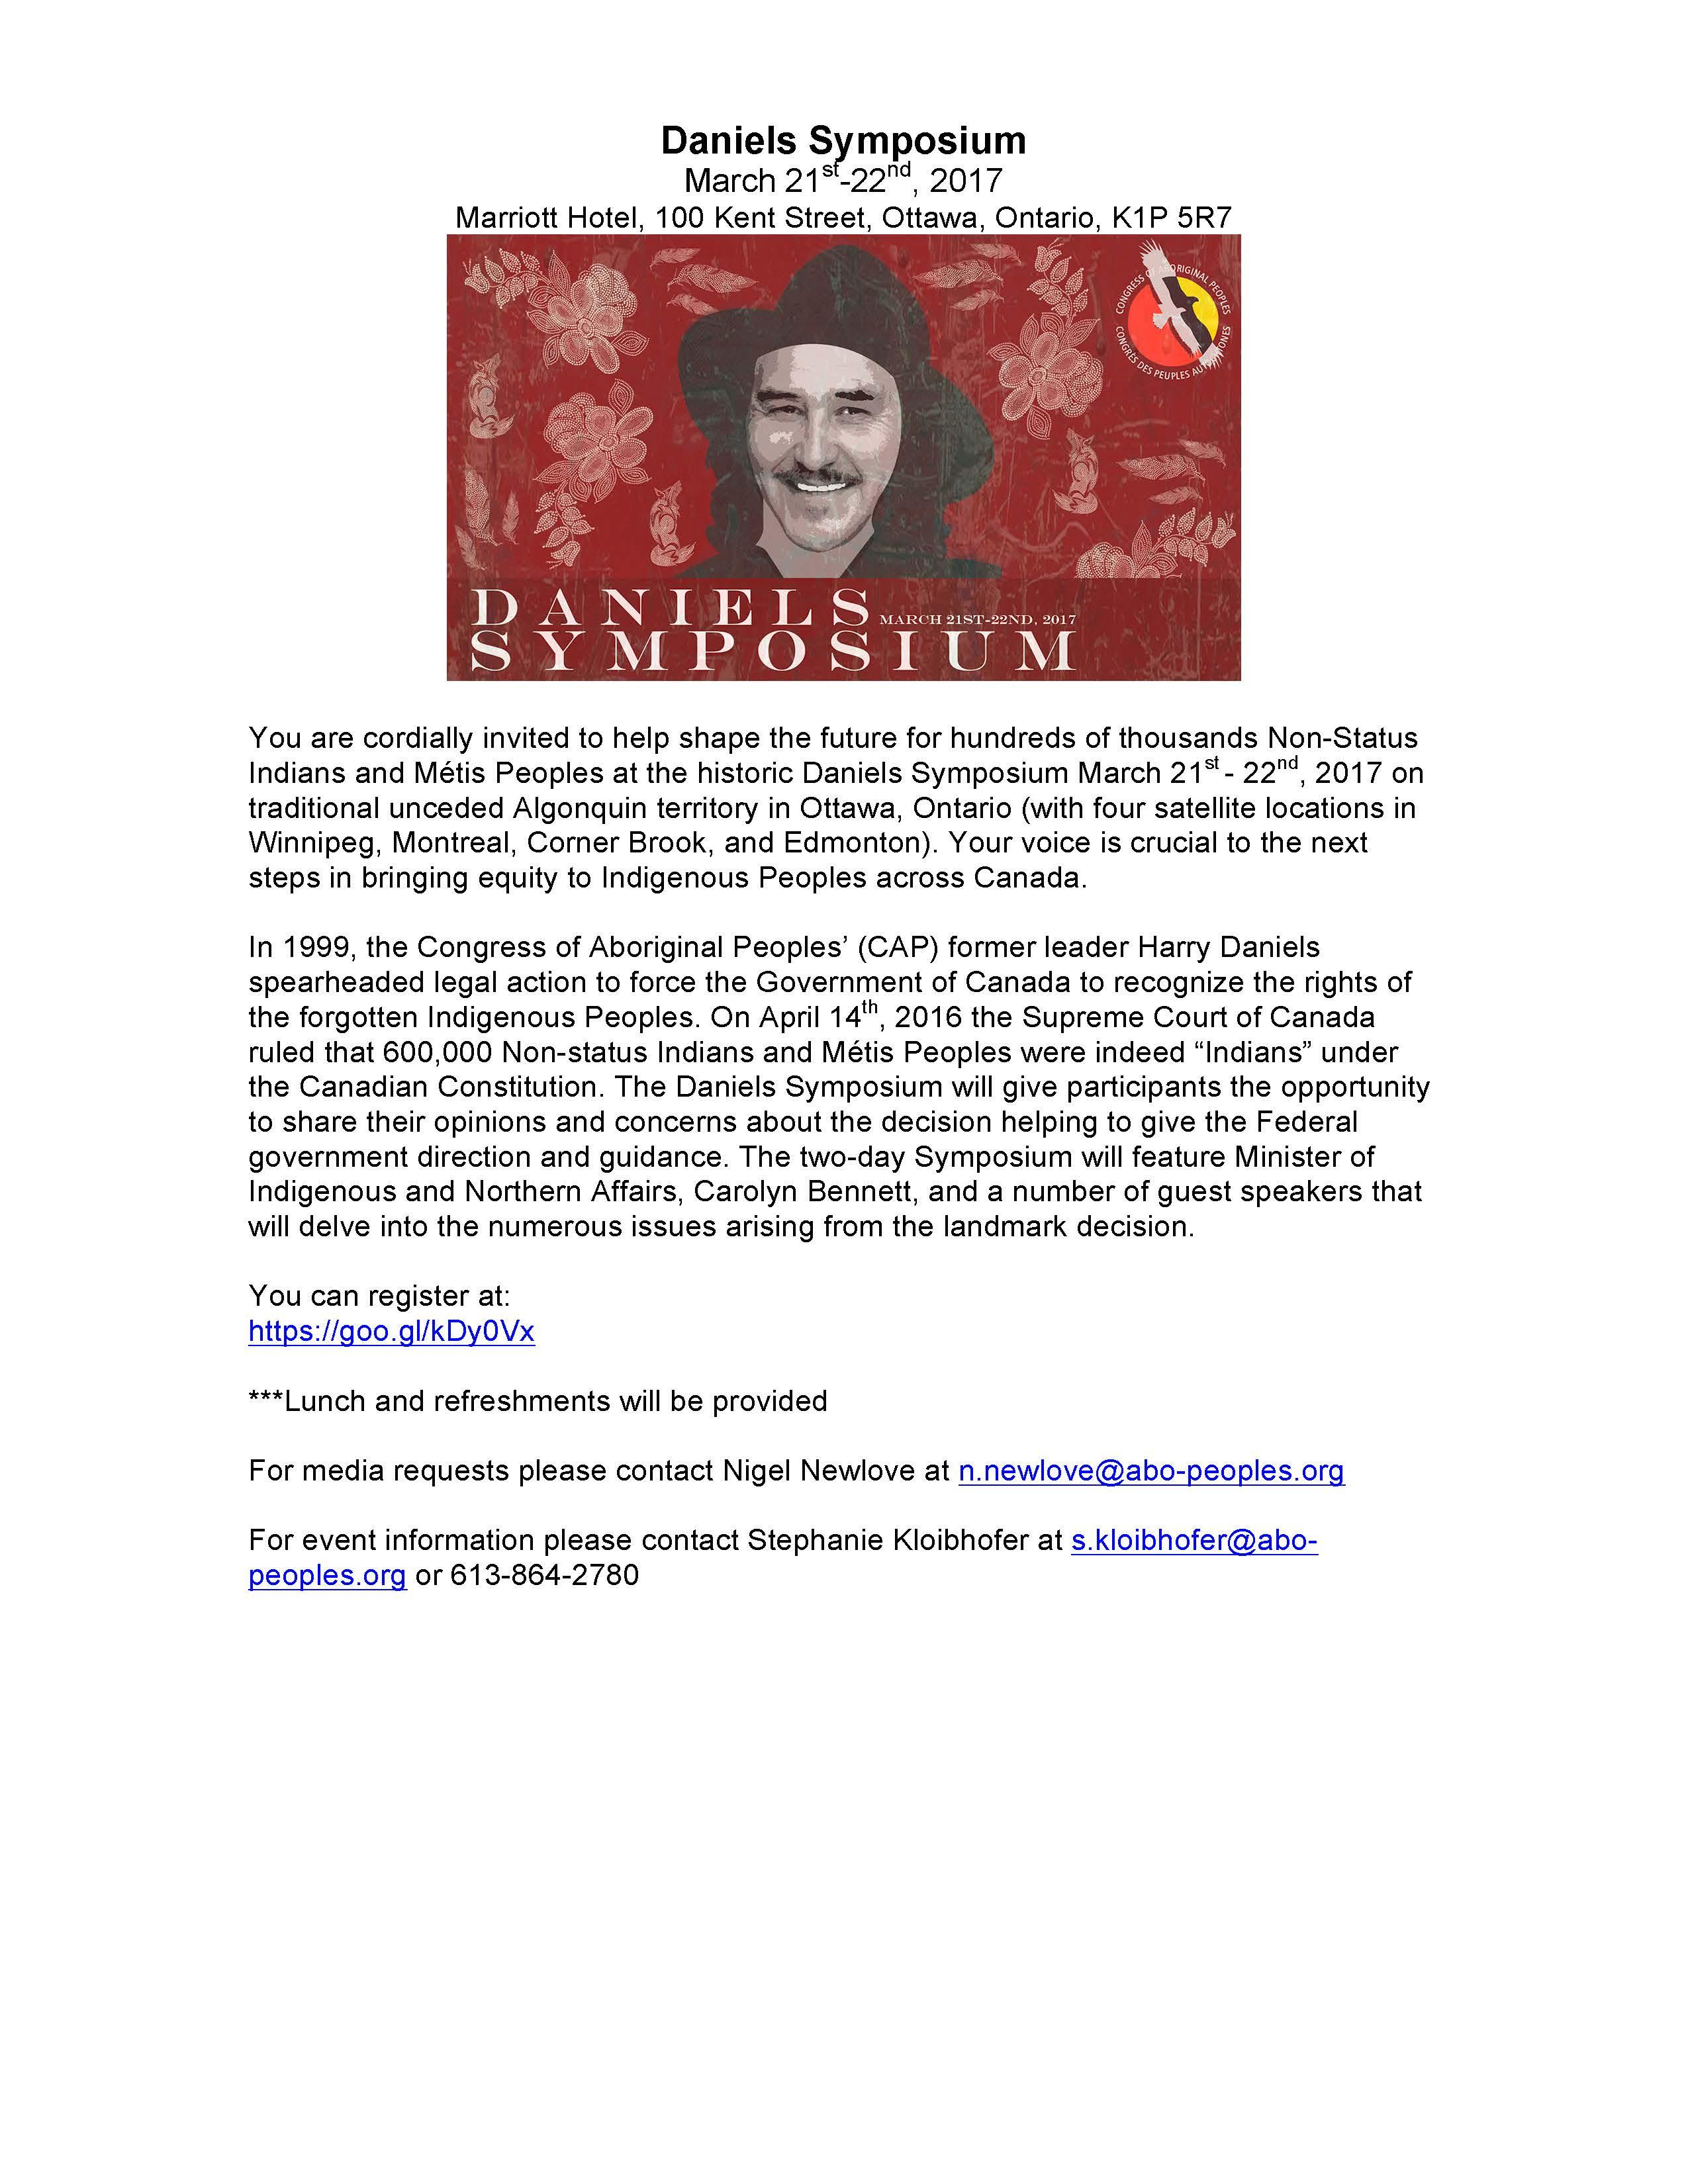 Daniels Symposium March 21-22 2017 Invitation copy 2_Page_1